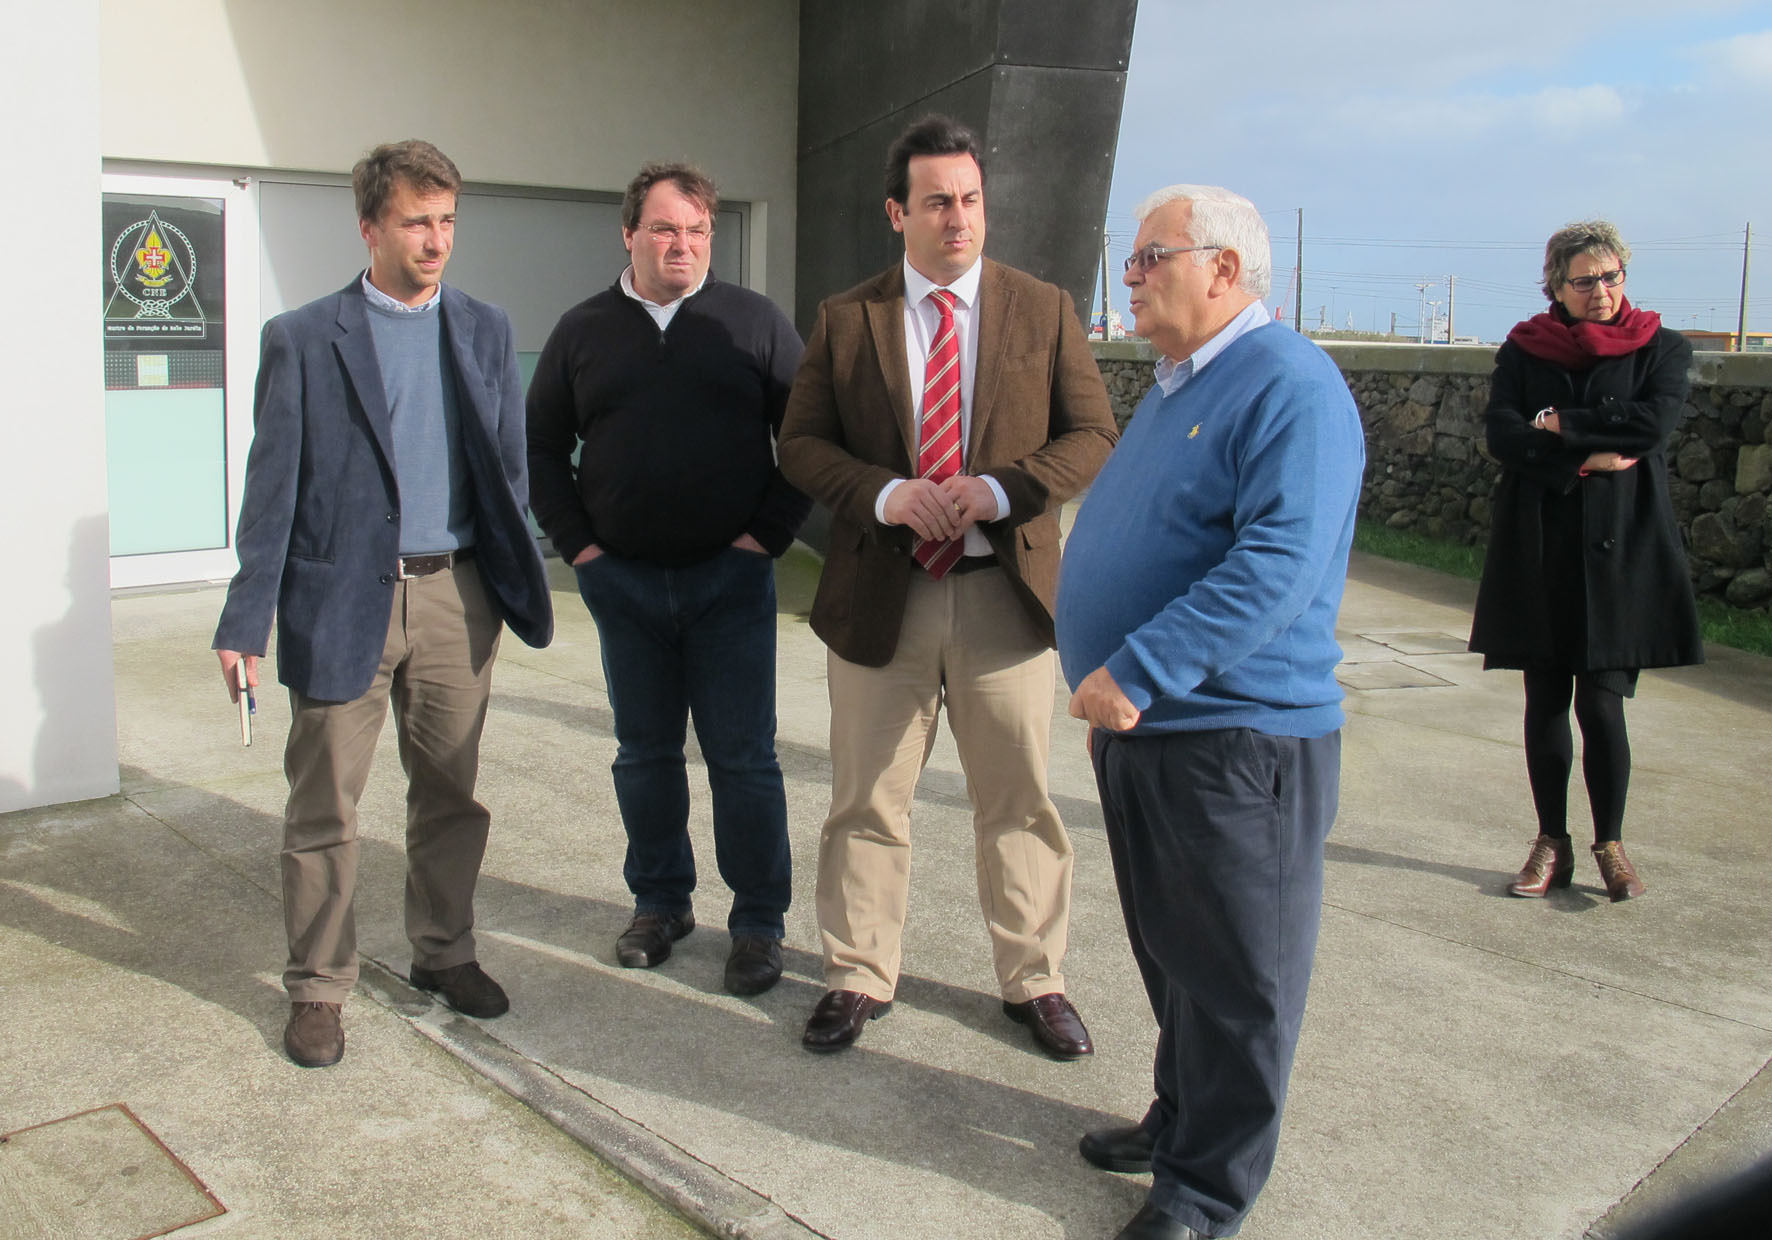 Berto Messias enaltece trabalho dos Escuteiros nos Açores